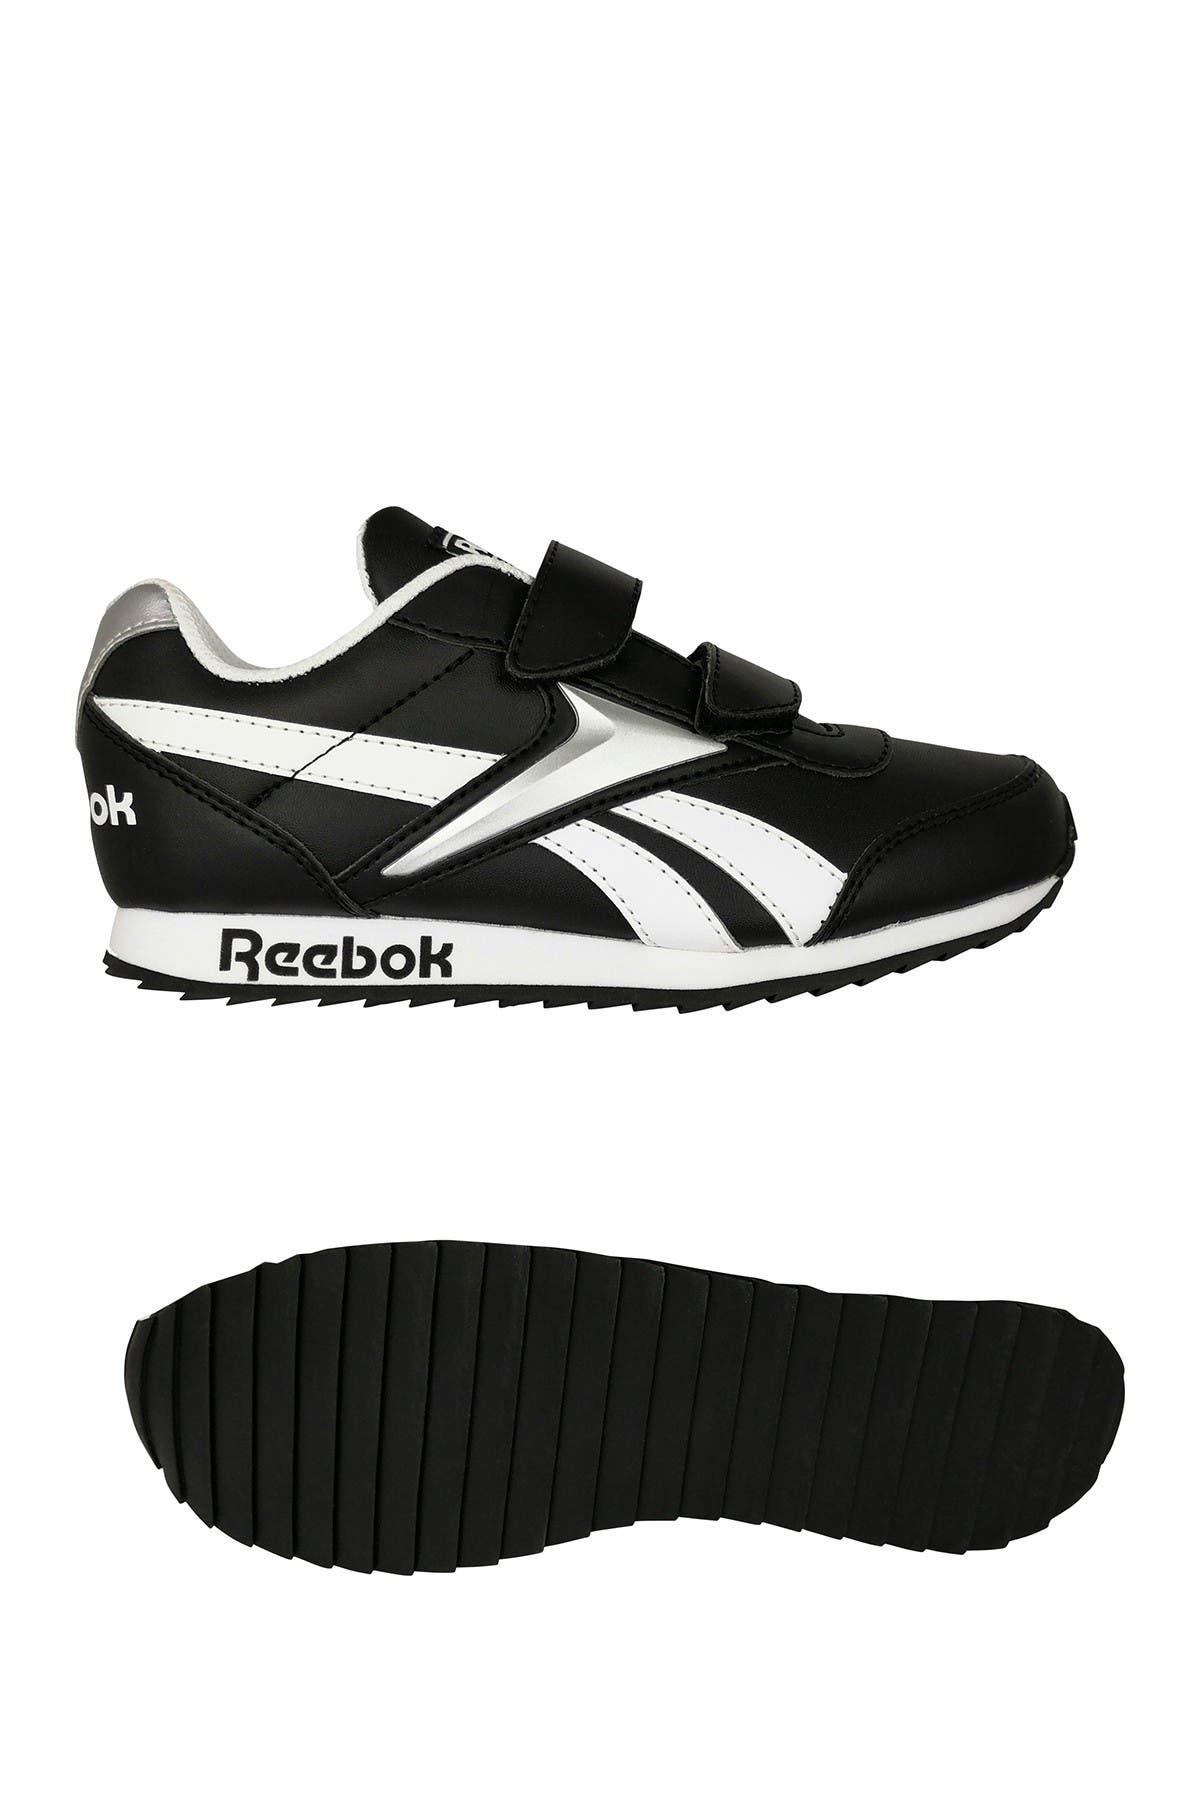 Image of Reebok Royal Double Strap Jogger Sneaker